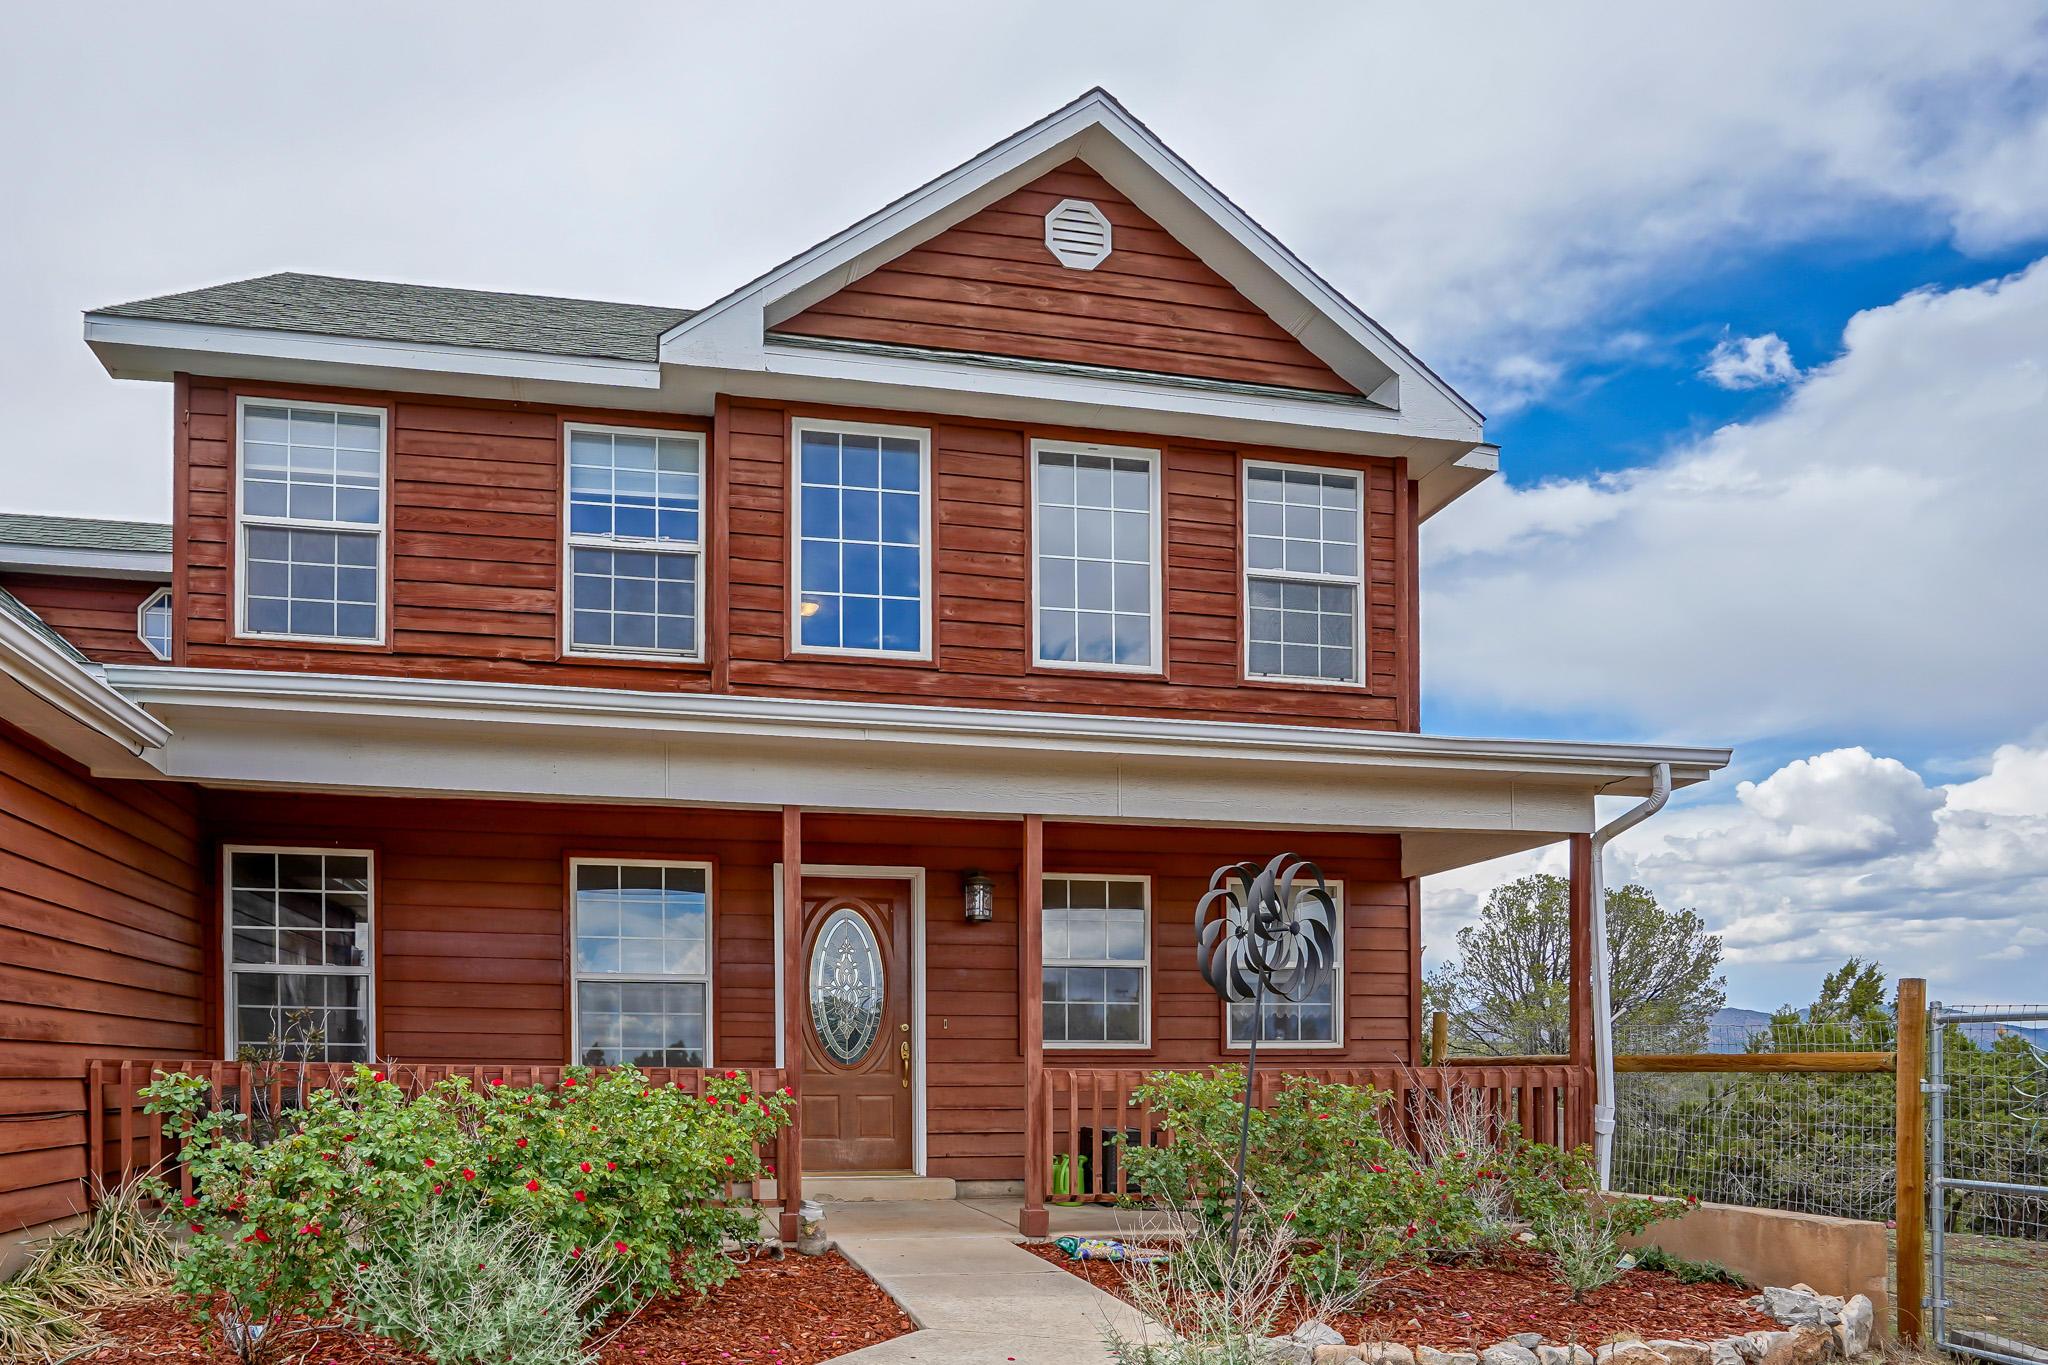 83 Thunder Mountain Road, Edgewood, NM 87015 - Edgewood, NM real estate listing